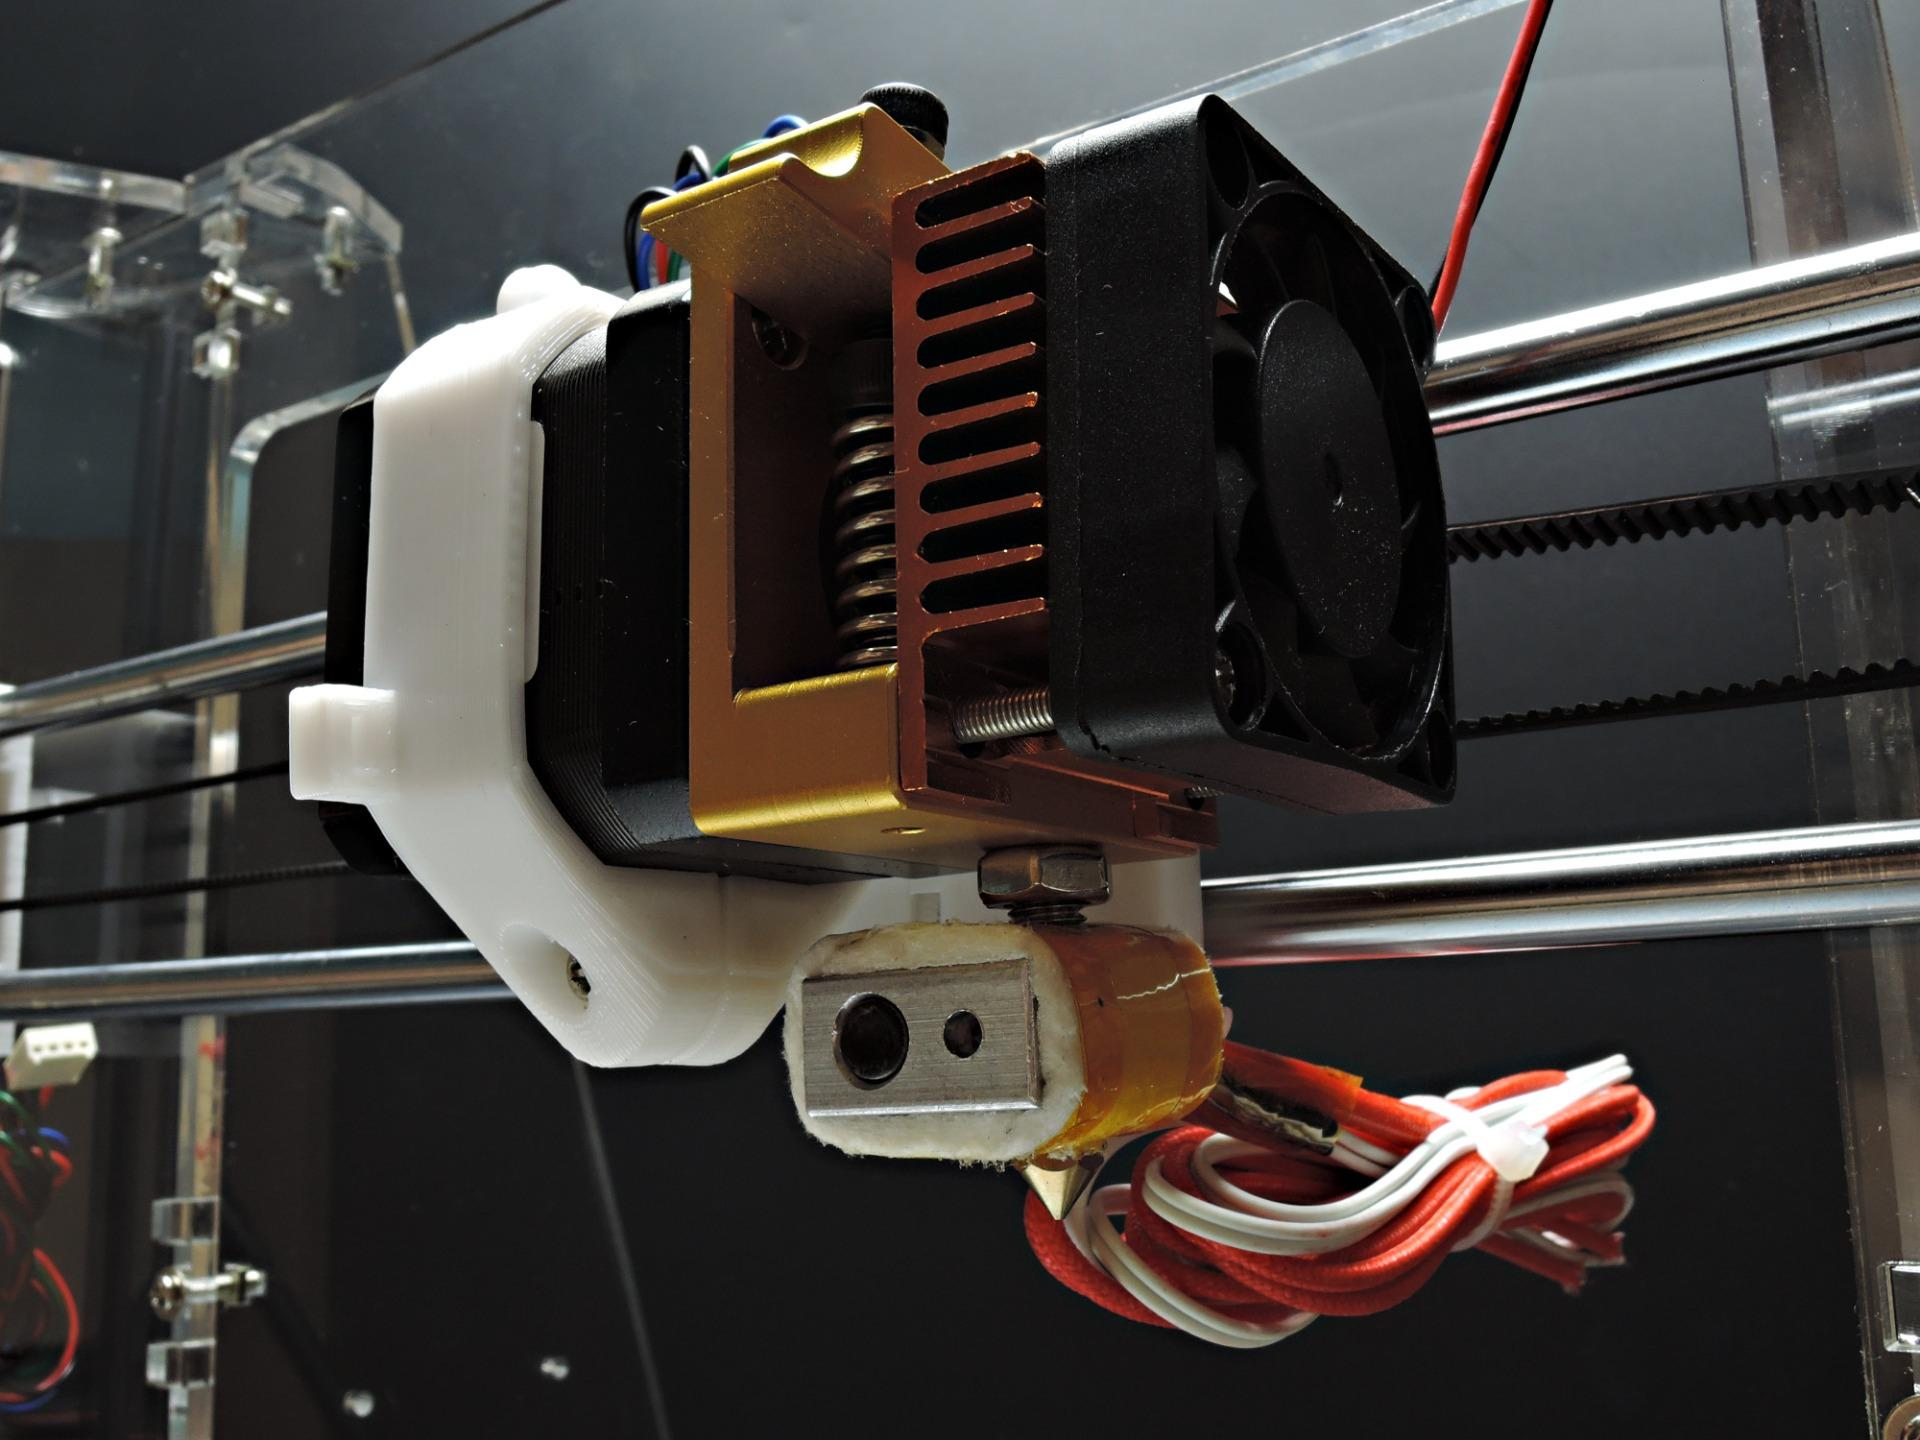 SINTRON] High Accuracy DIY 3D Printer Kit for Reprap Prusa